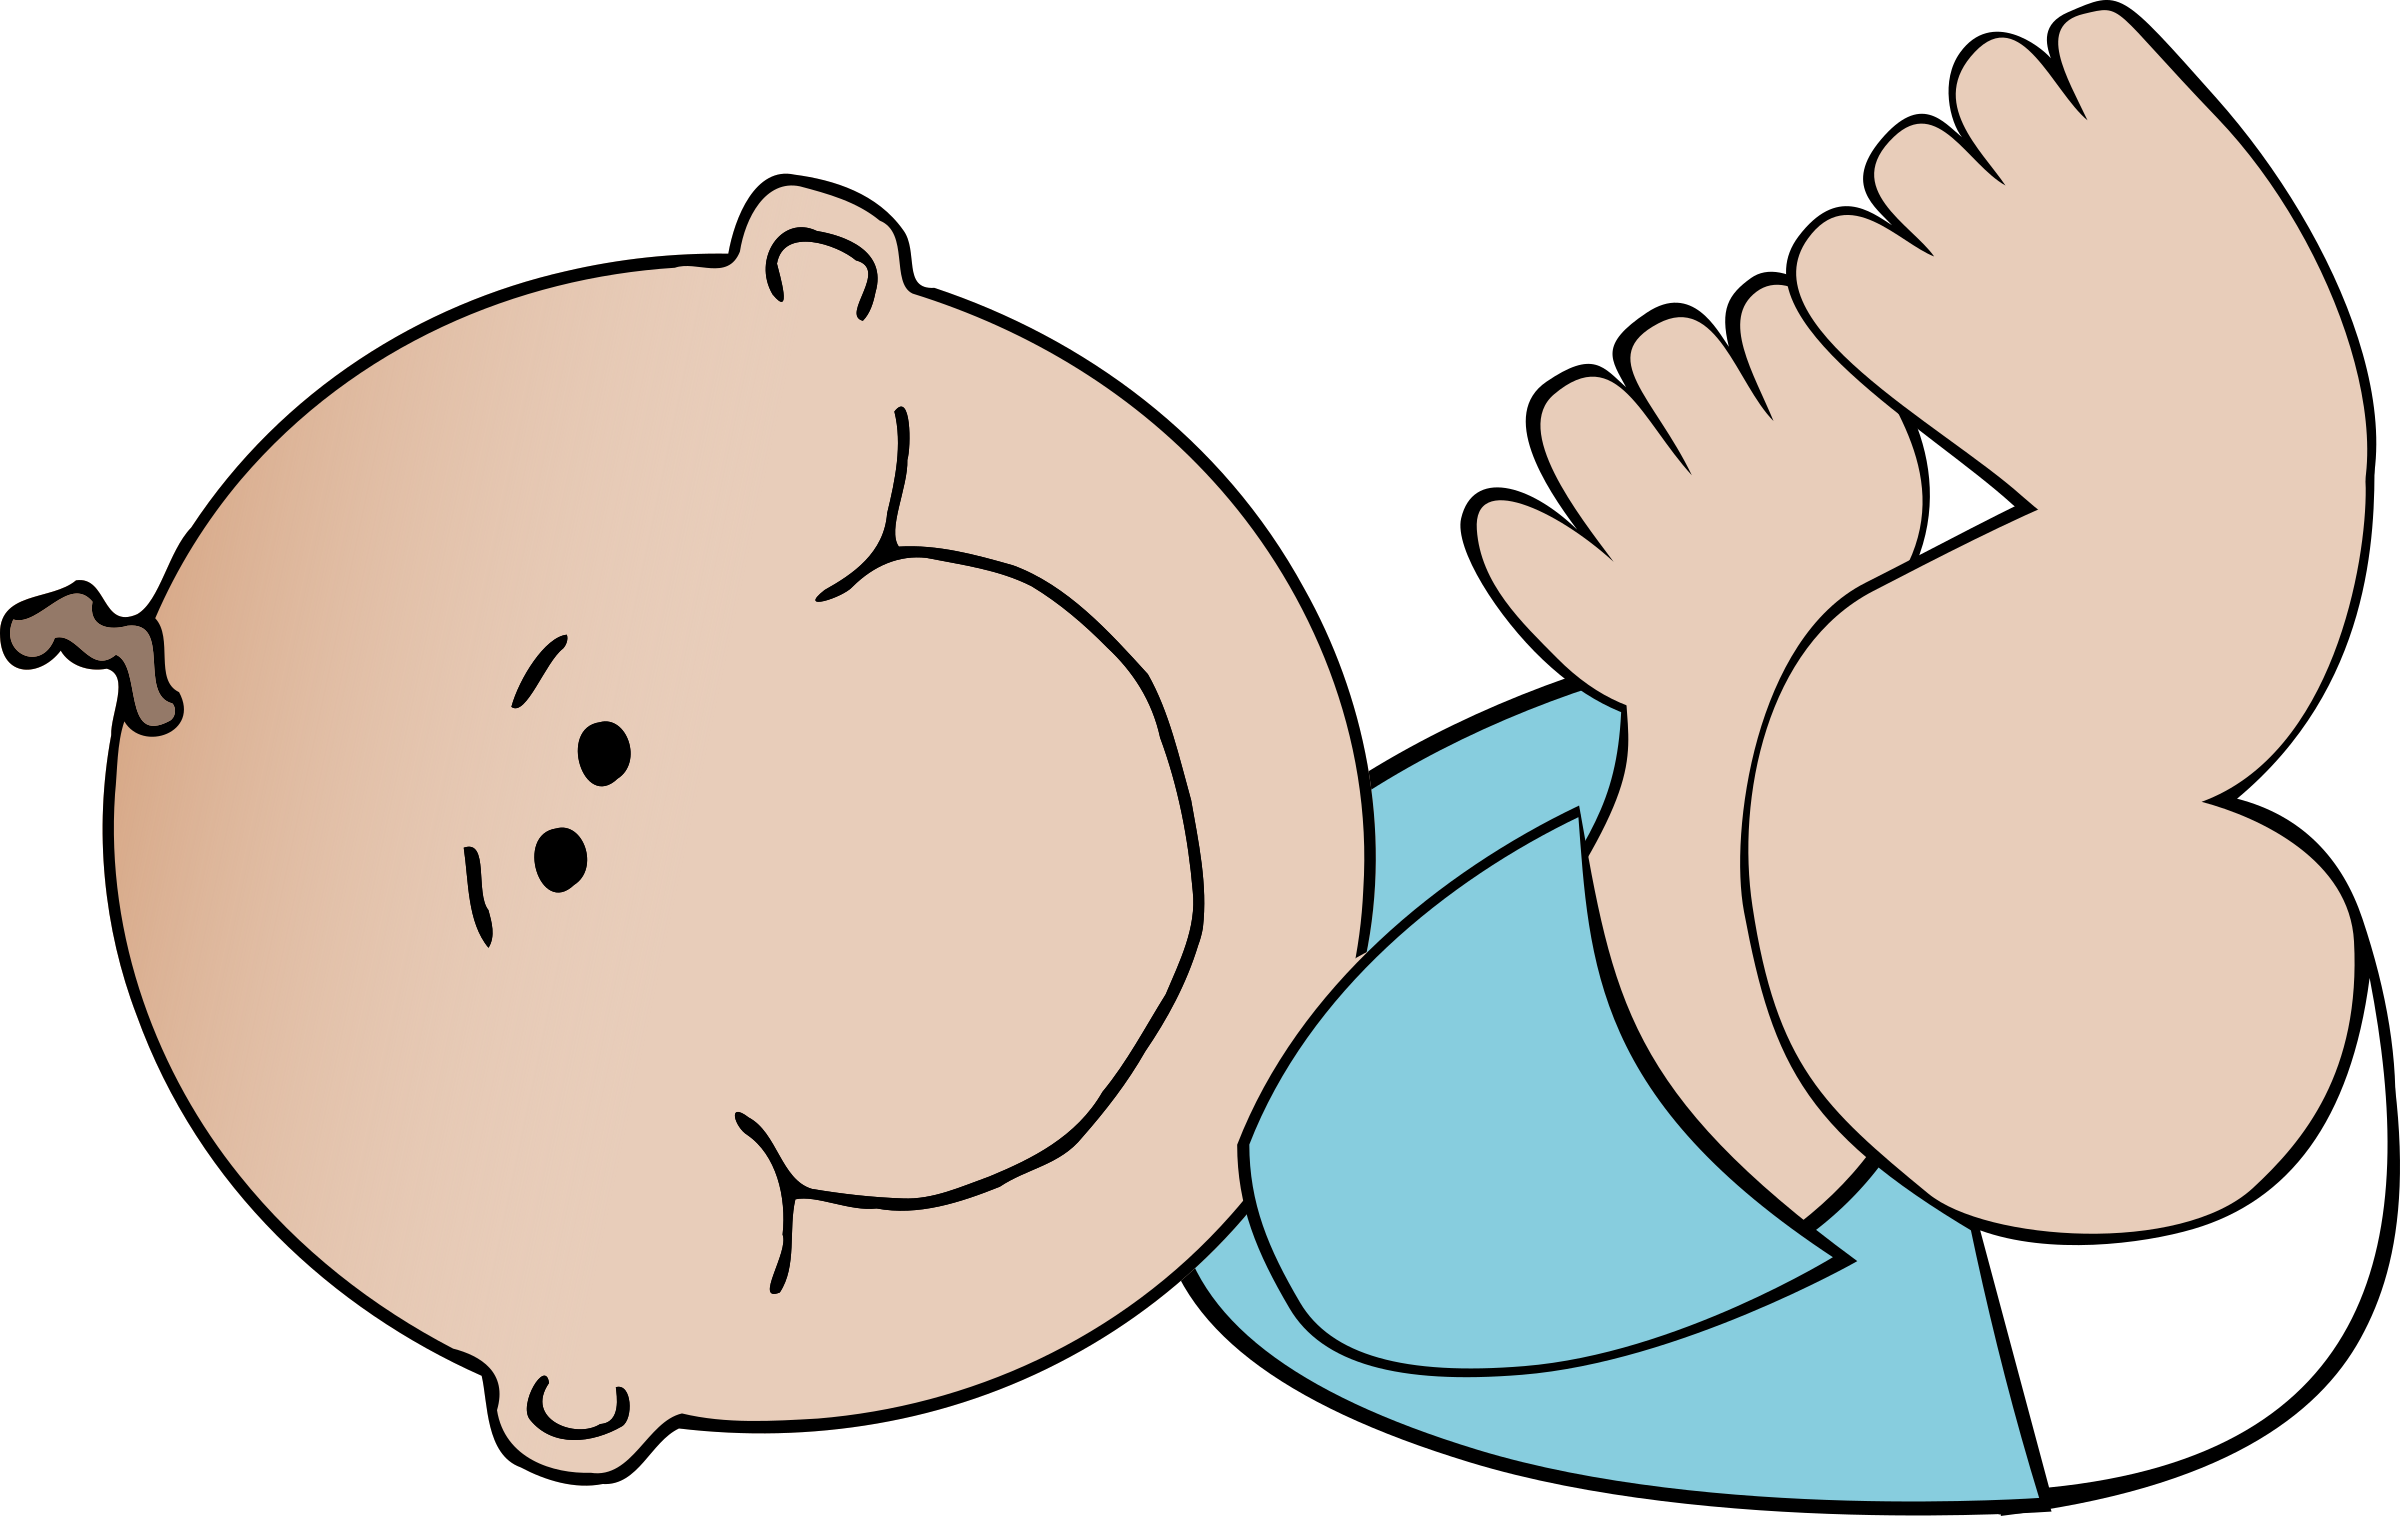 Infant clipart sit. Baby boy lying big